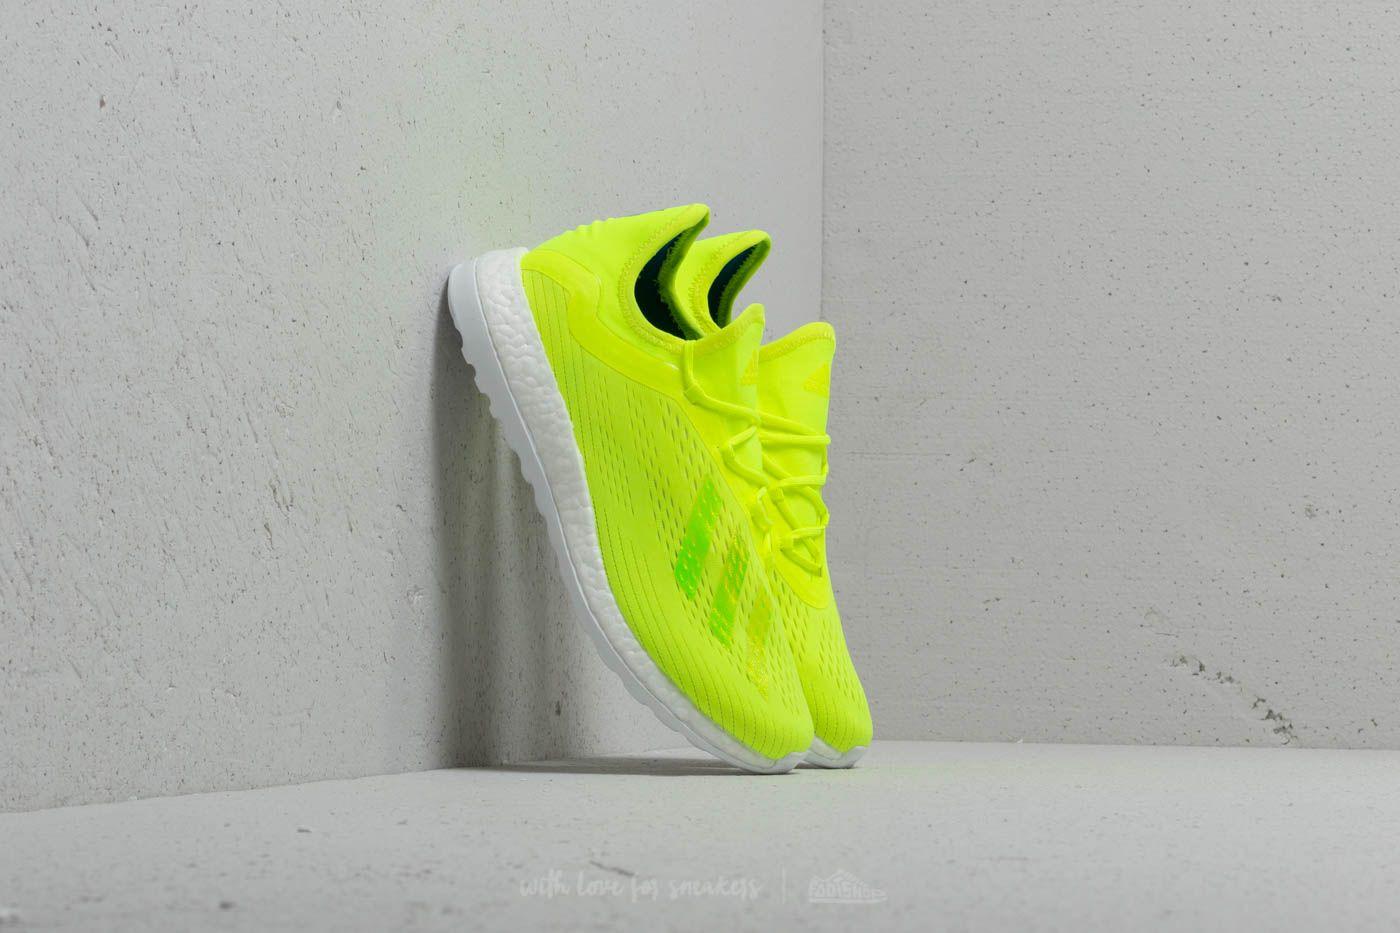 comprar mejor Precio reducido grandes ofertas 2017 adidas x 18 tr black white green shoes